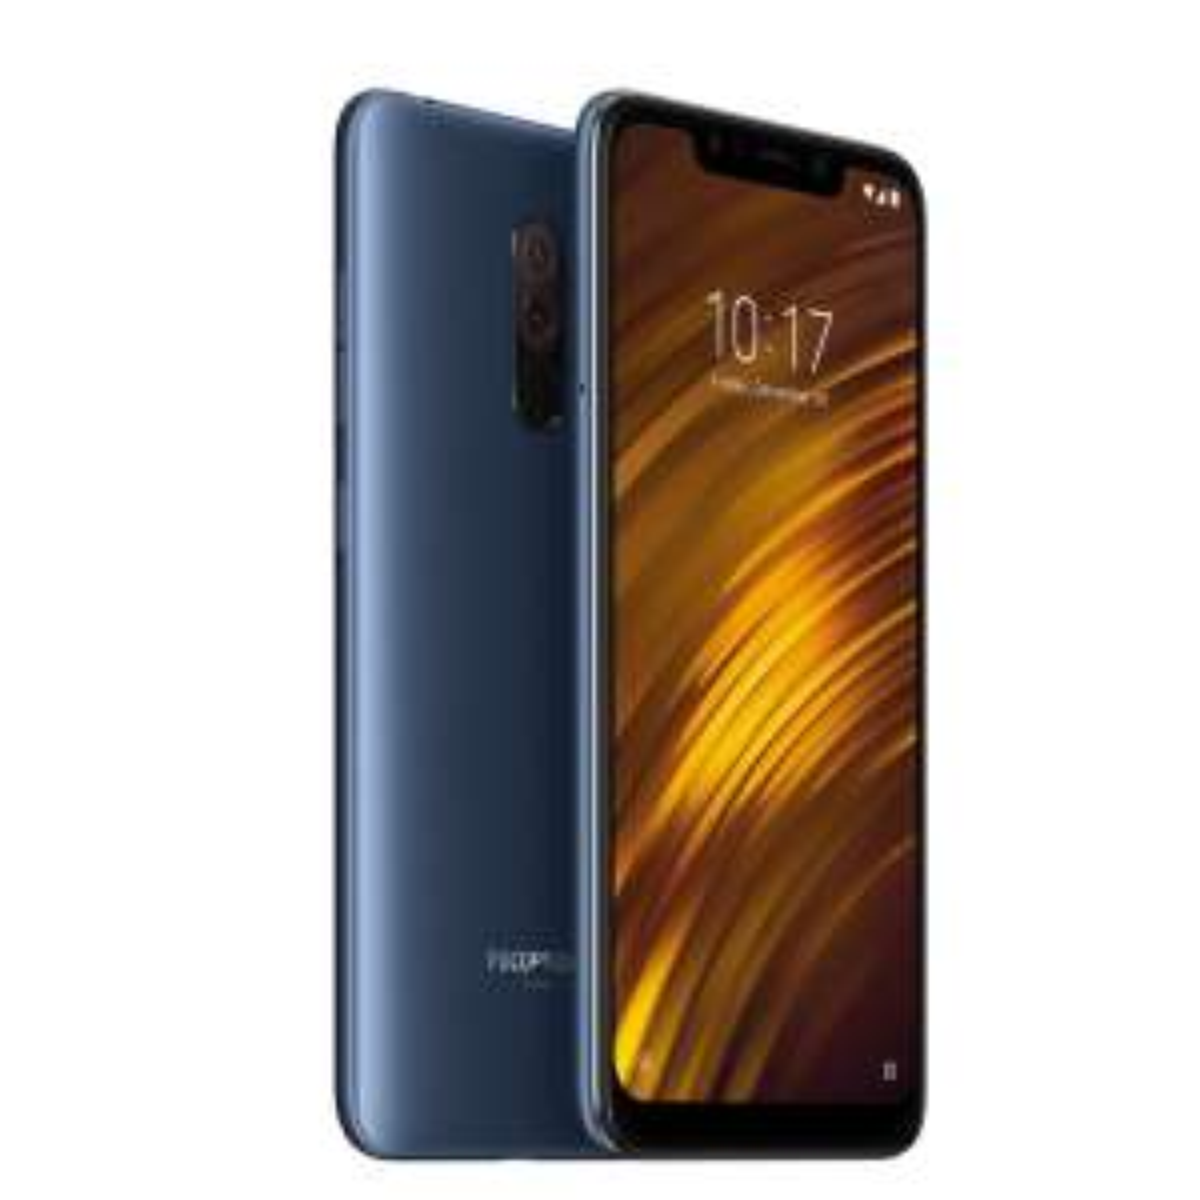 "Smartphone 6.21"" Xiaomi Pocophone F1 - FHD+, SnapDragon 845, 6 Go de RAM, 64 Go, Bleu (160.11€ avec le code ETE15)"